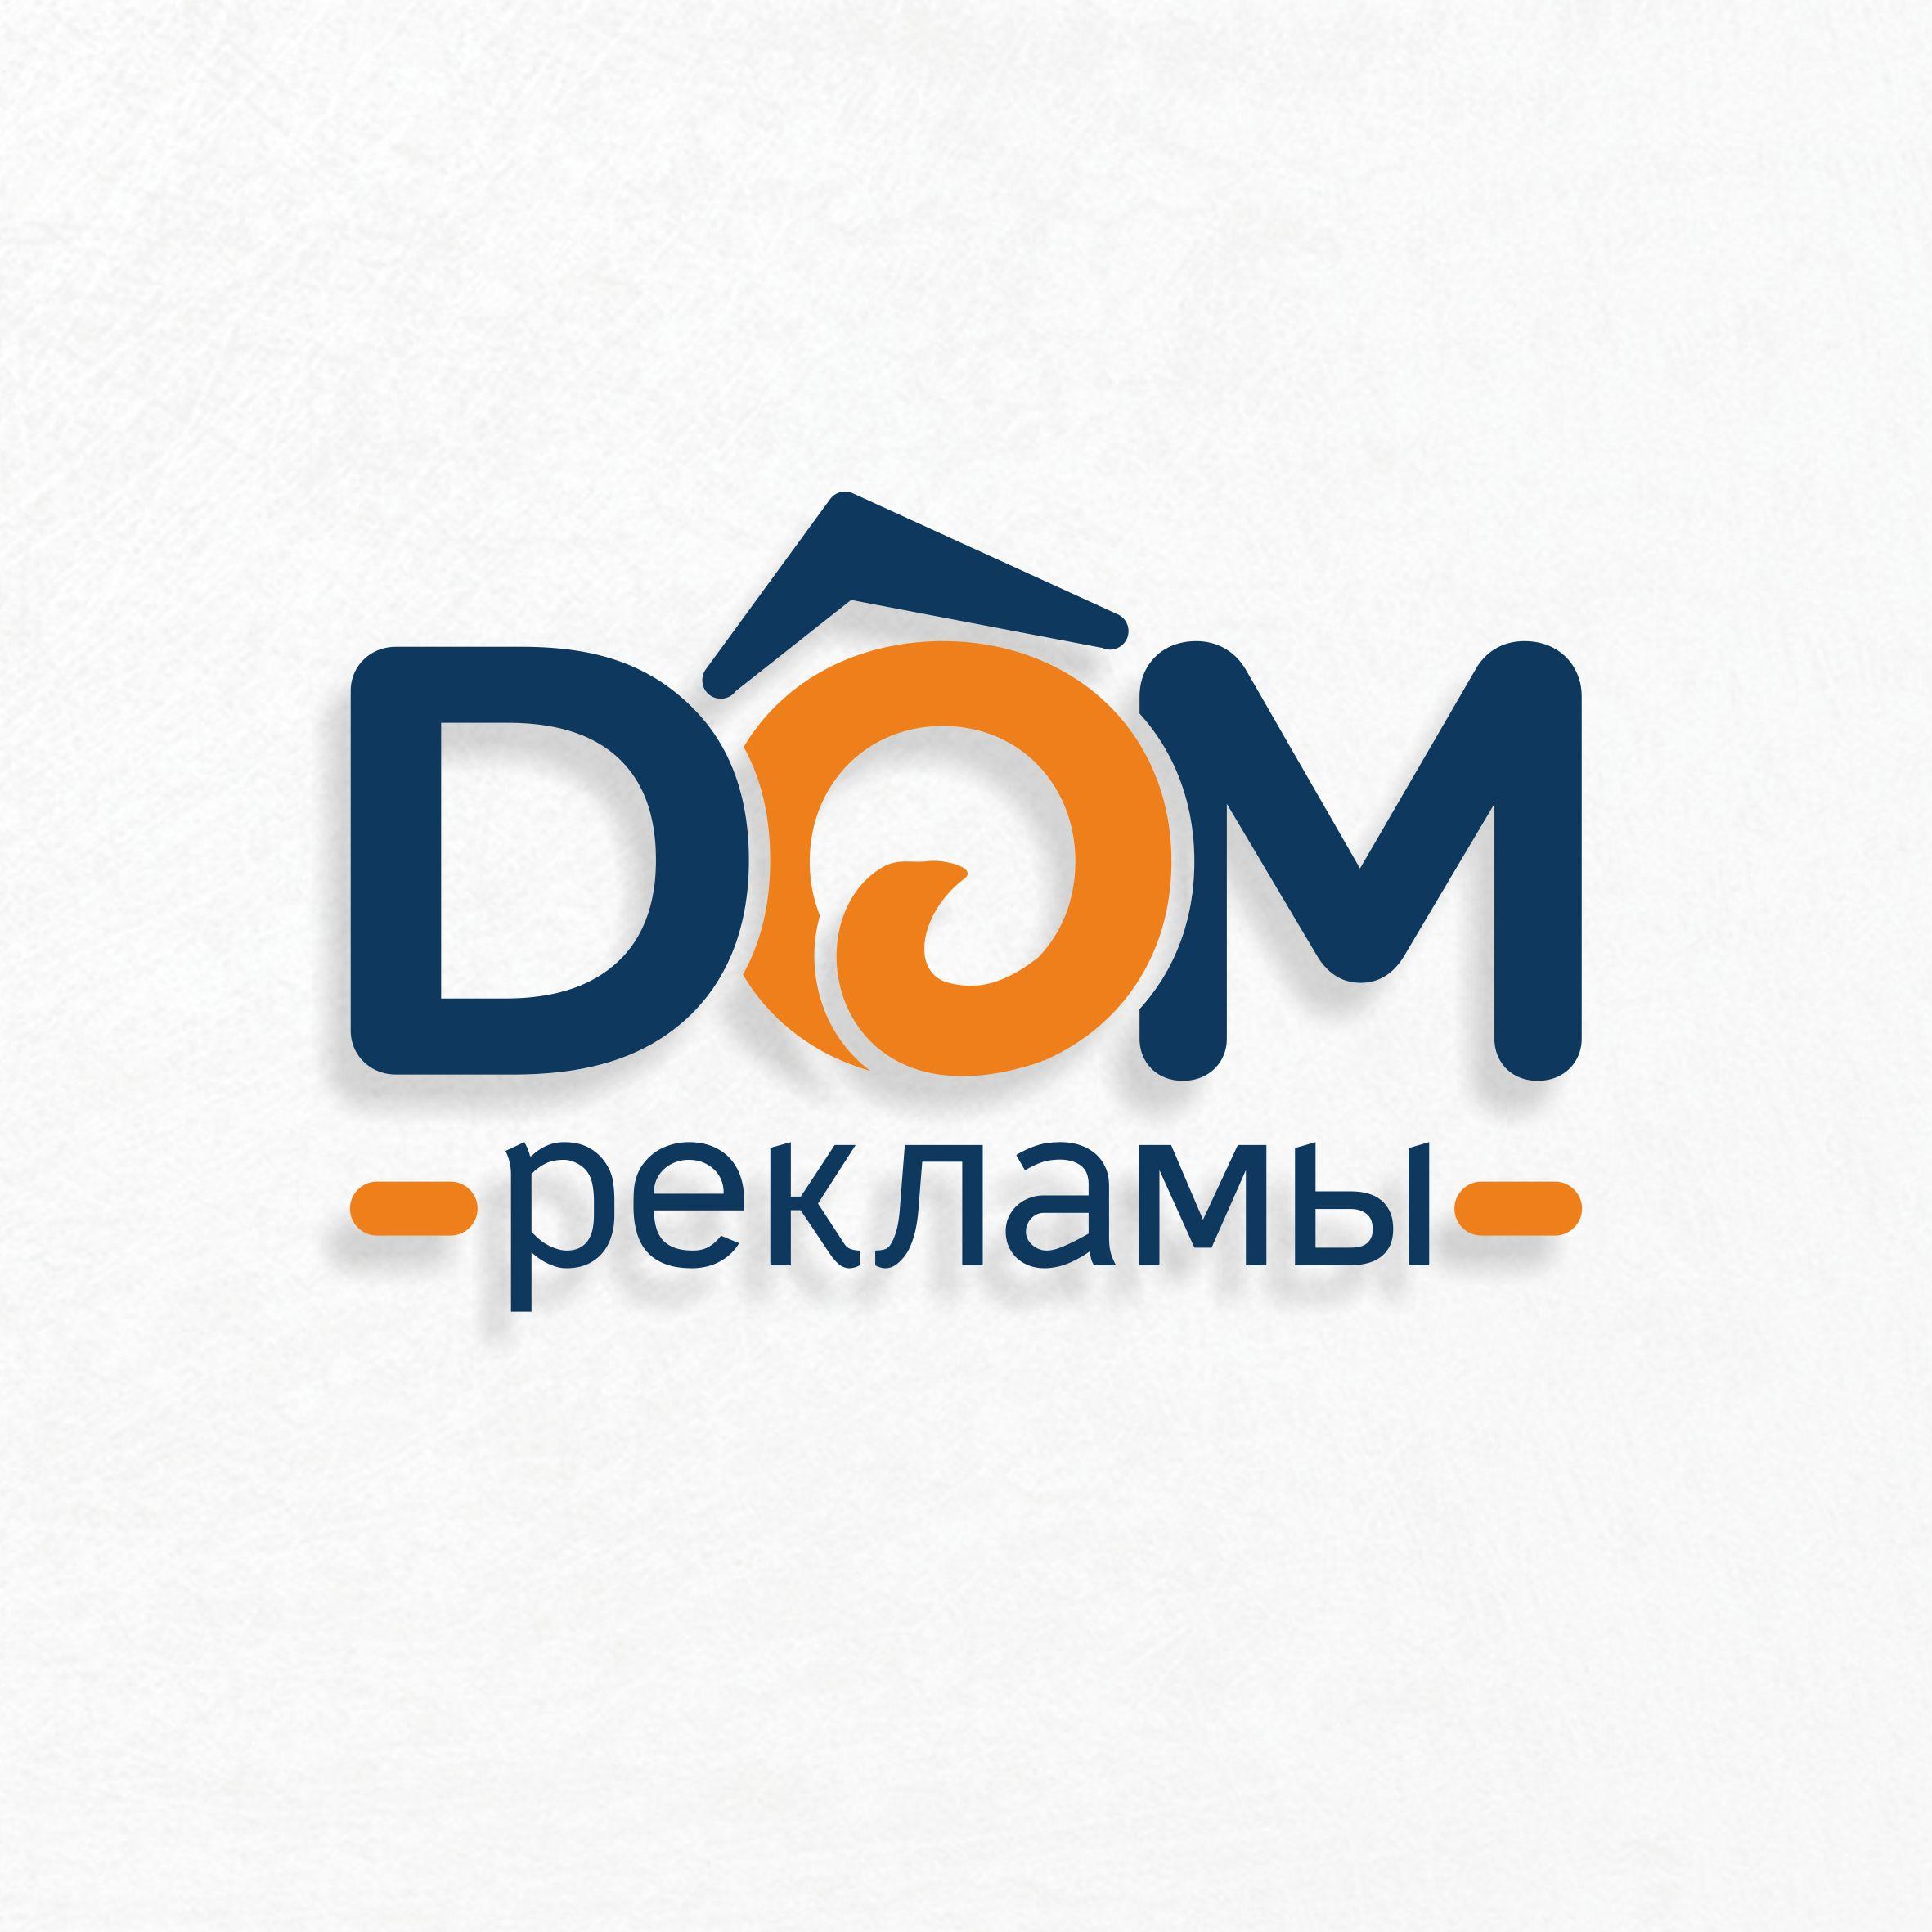 Дизайн логотипа рекламно-производственной компании фото f_9235edbc4ba9367e.jpg